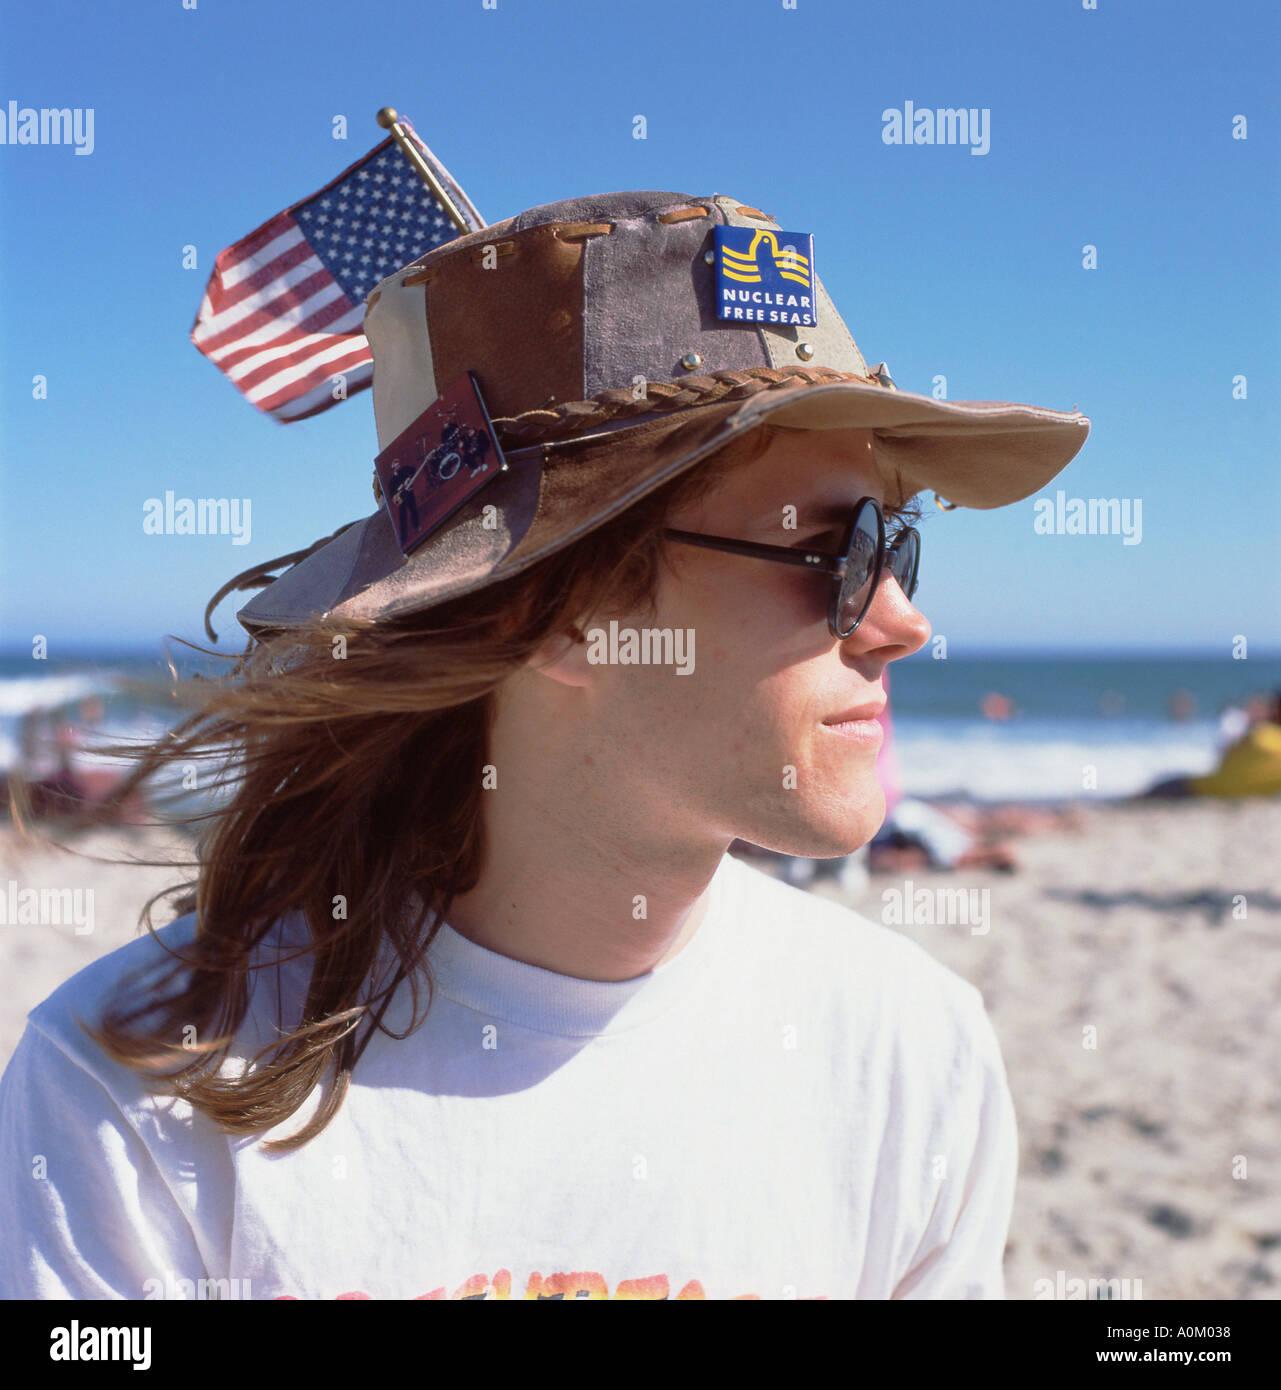 A young man wearing Greenpeace nuclear free seas badge and an American flag on his hat Malibu LA California USA    KATHY DEWITT - Stock Image